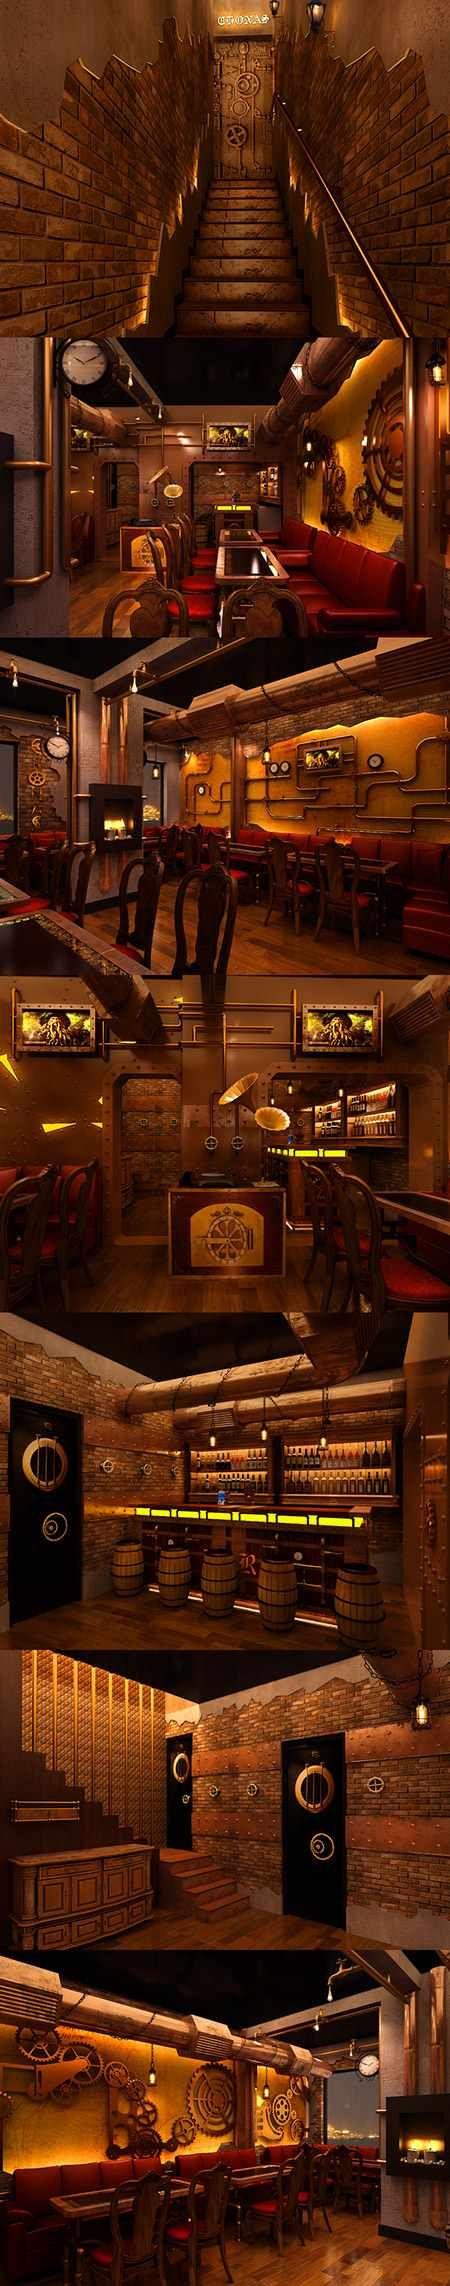 Steam punk restaurant  Techeblog.com